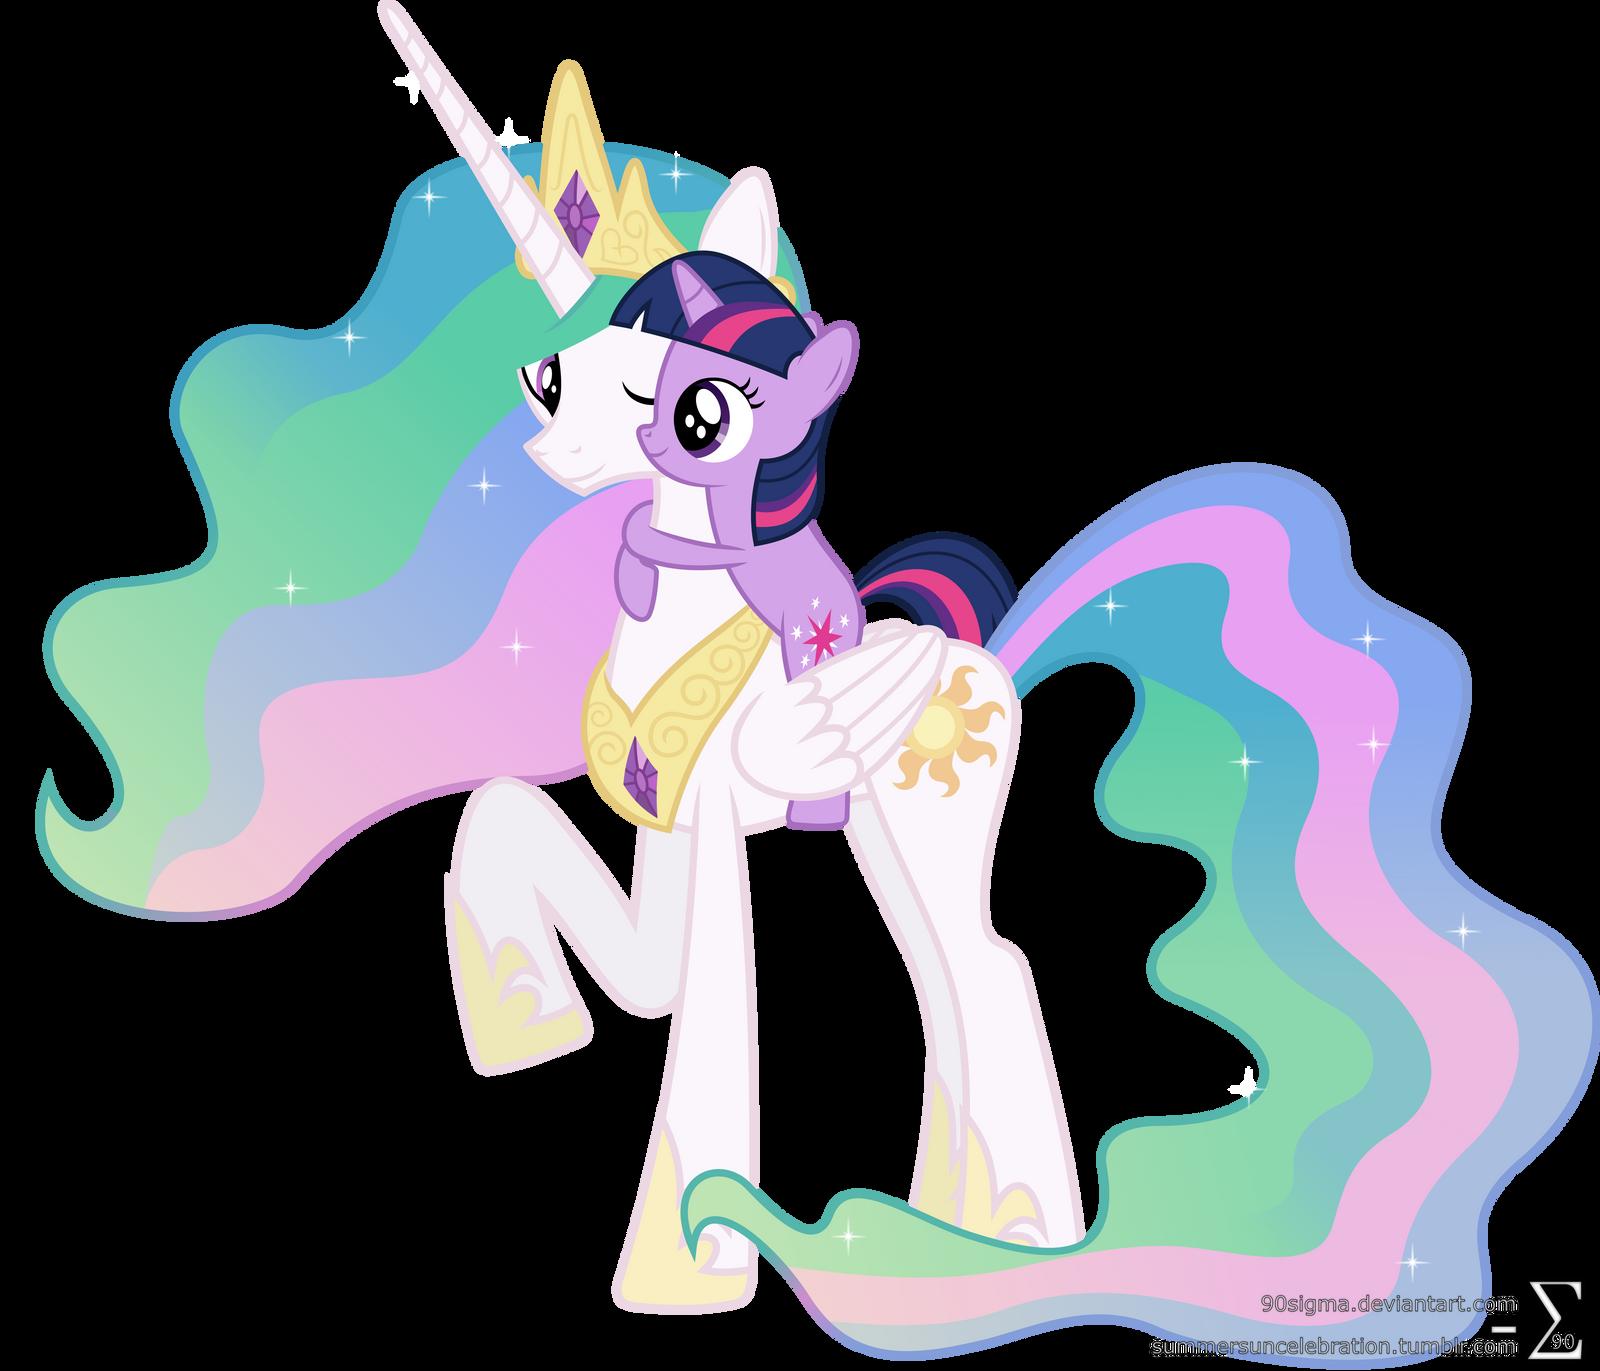 Princess Celestia and Twilight Sparkle Hugging  3  by 90SigmaPrincess Celestia And Twilight Sparkle Coloring Pages